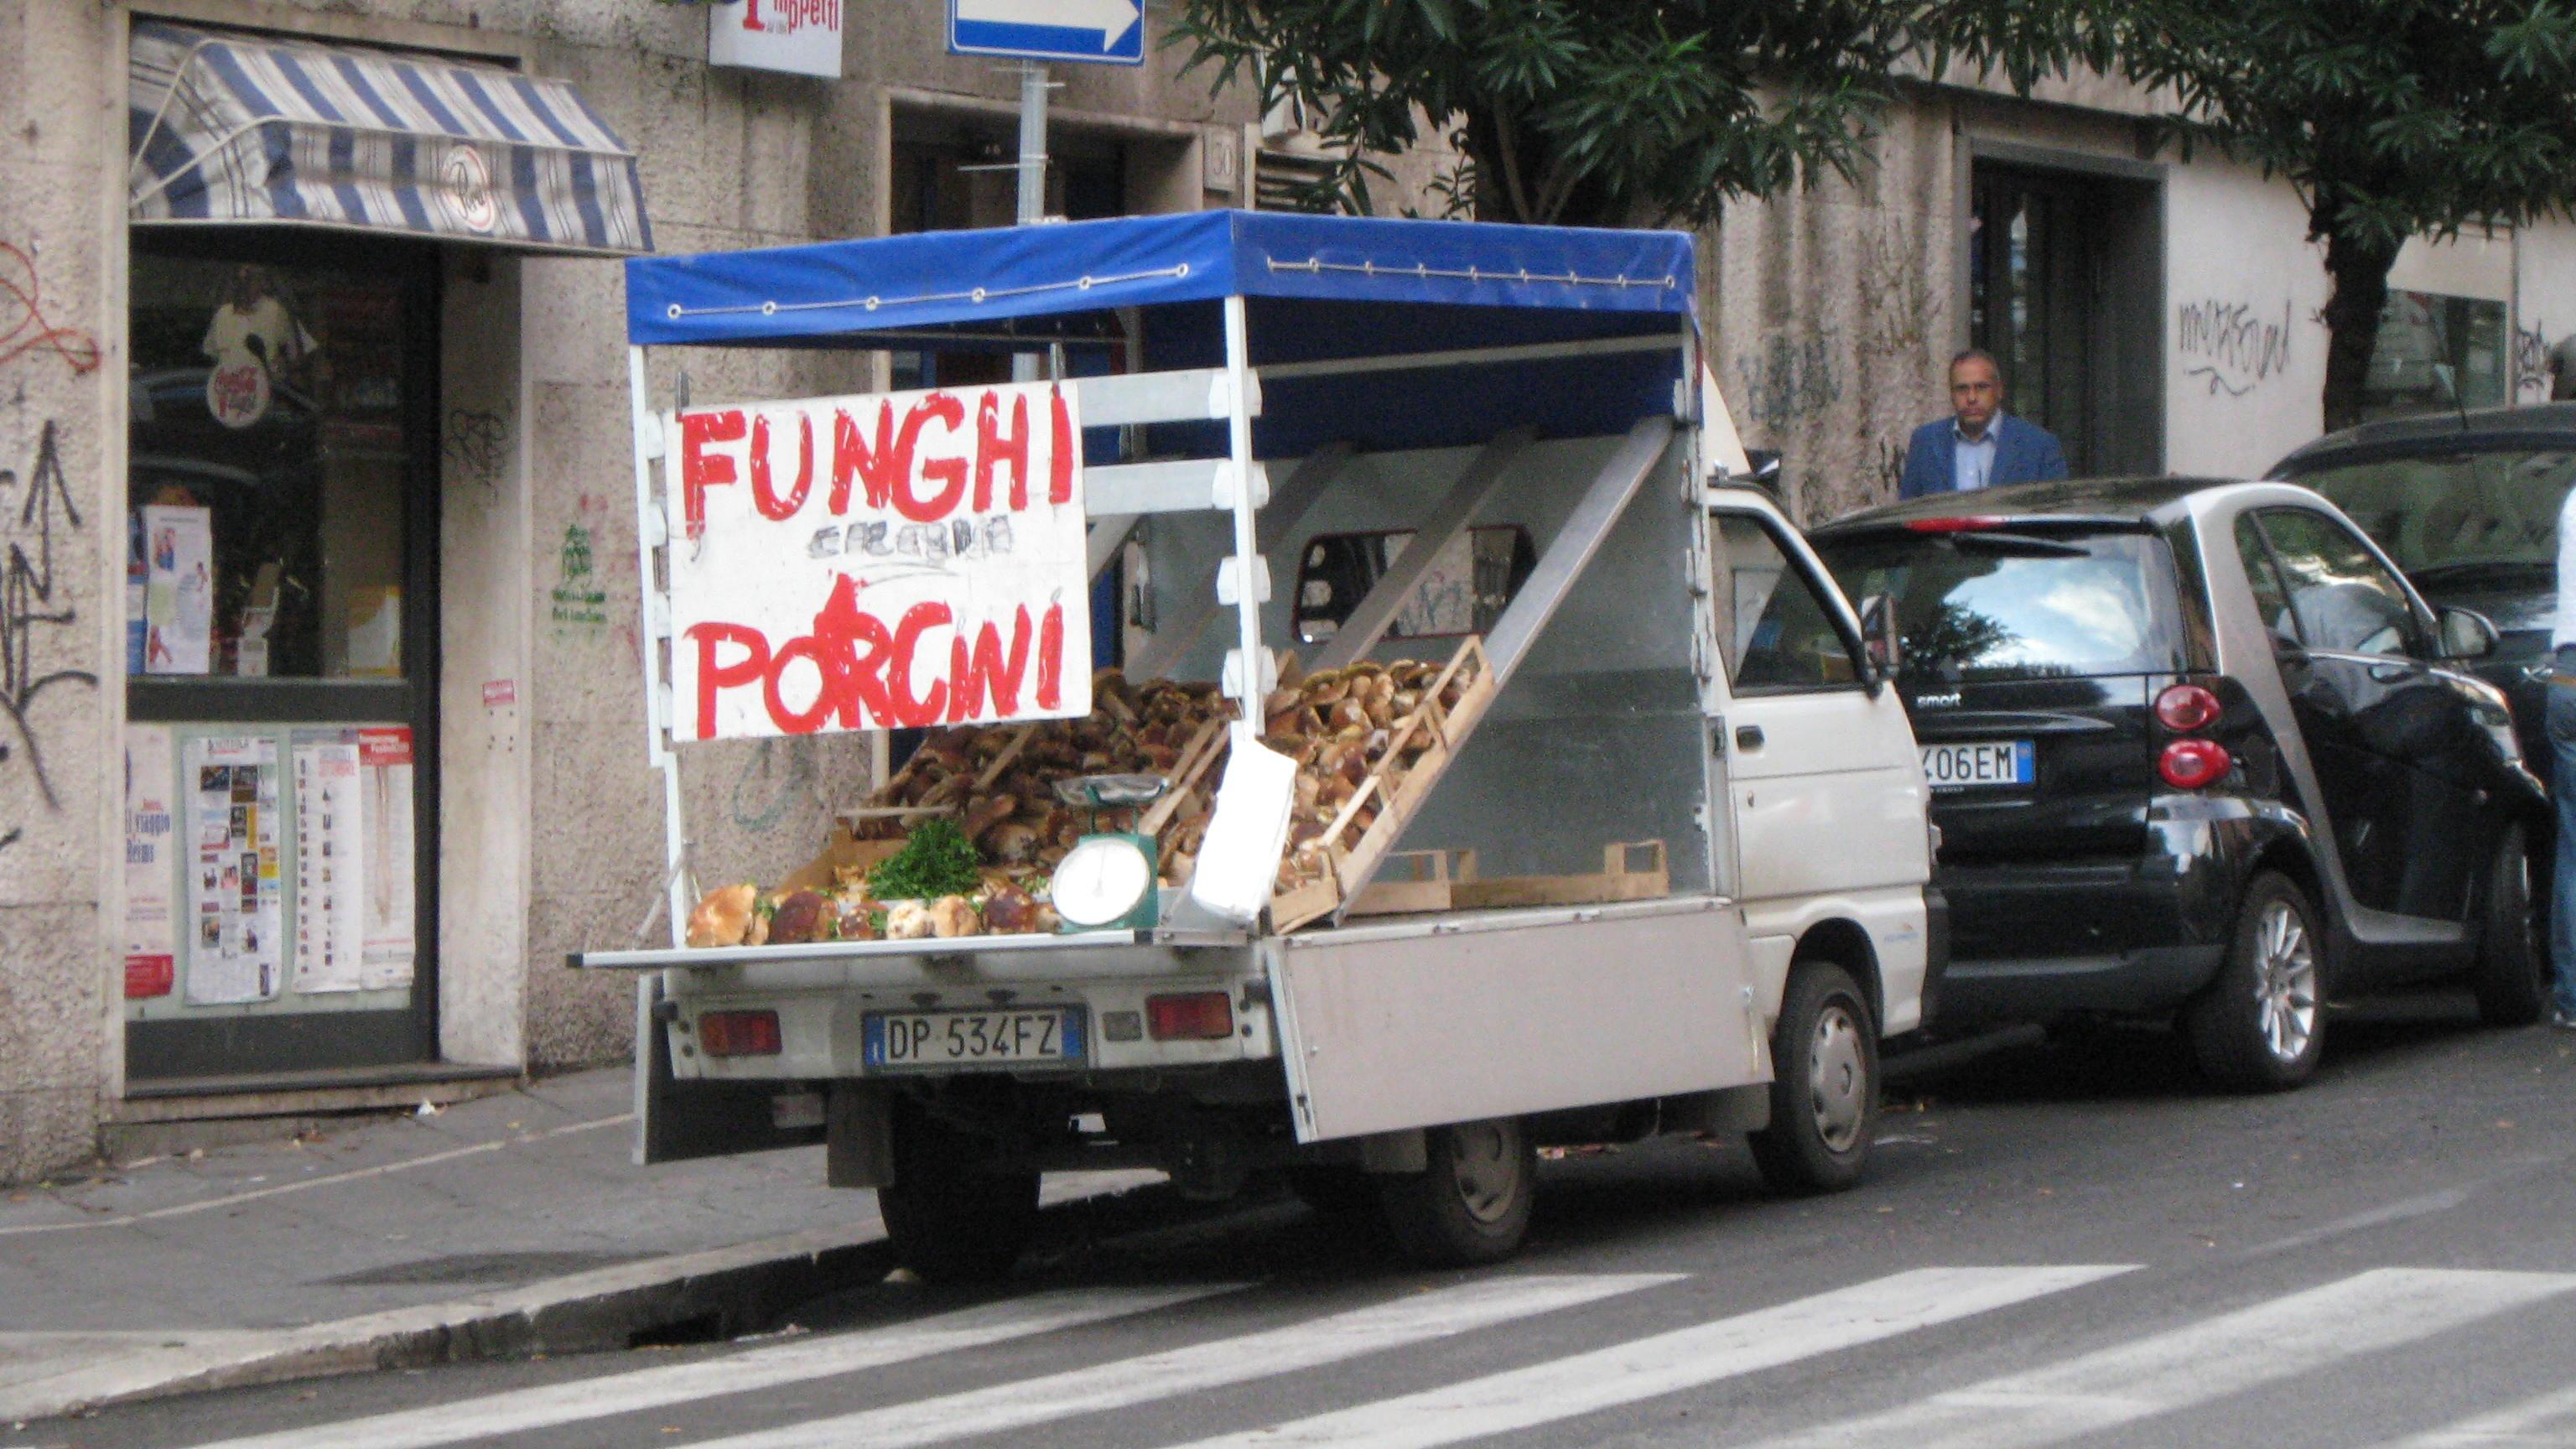 porcini cart